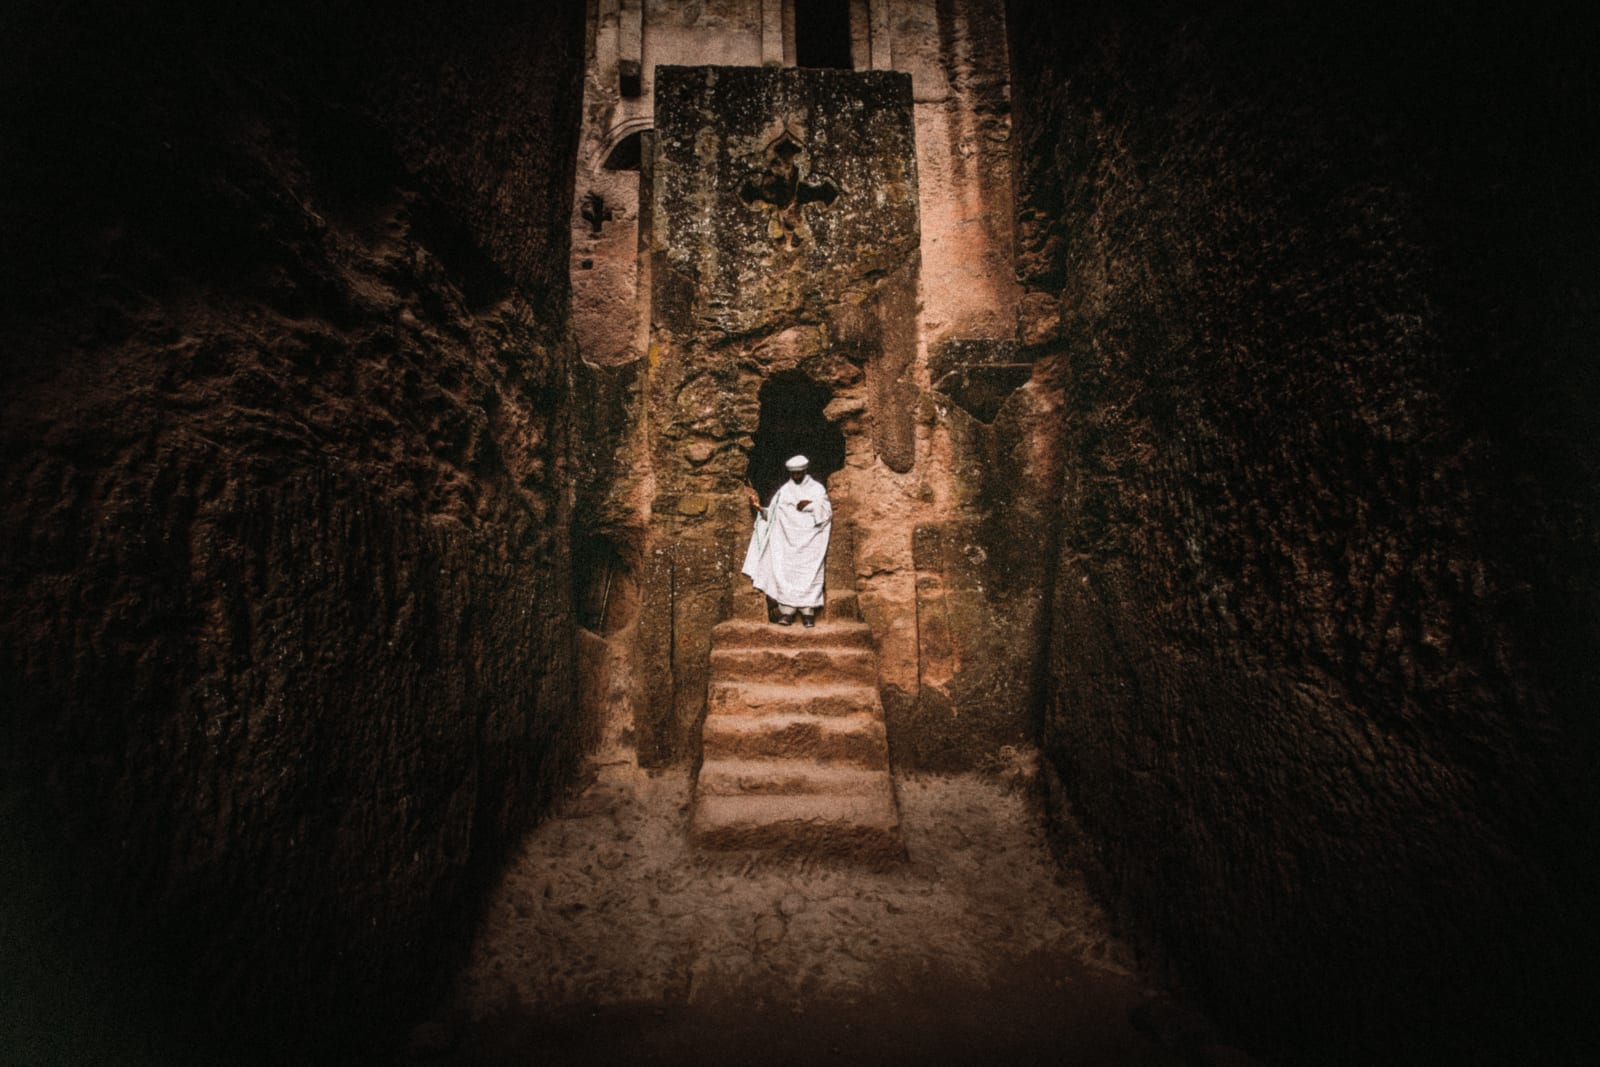 Abiy Solomon, Primordial Modernity: The Raw Spirit of Lalibela I, 2014